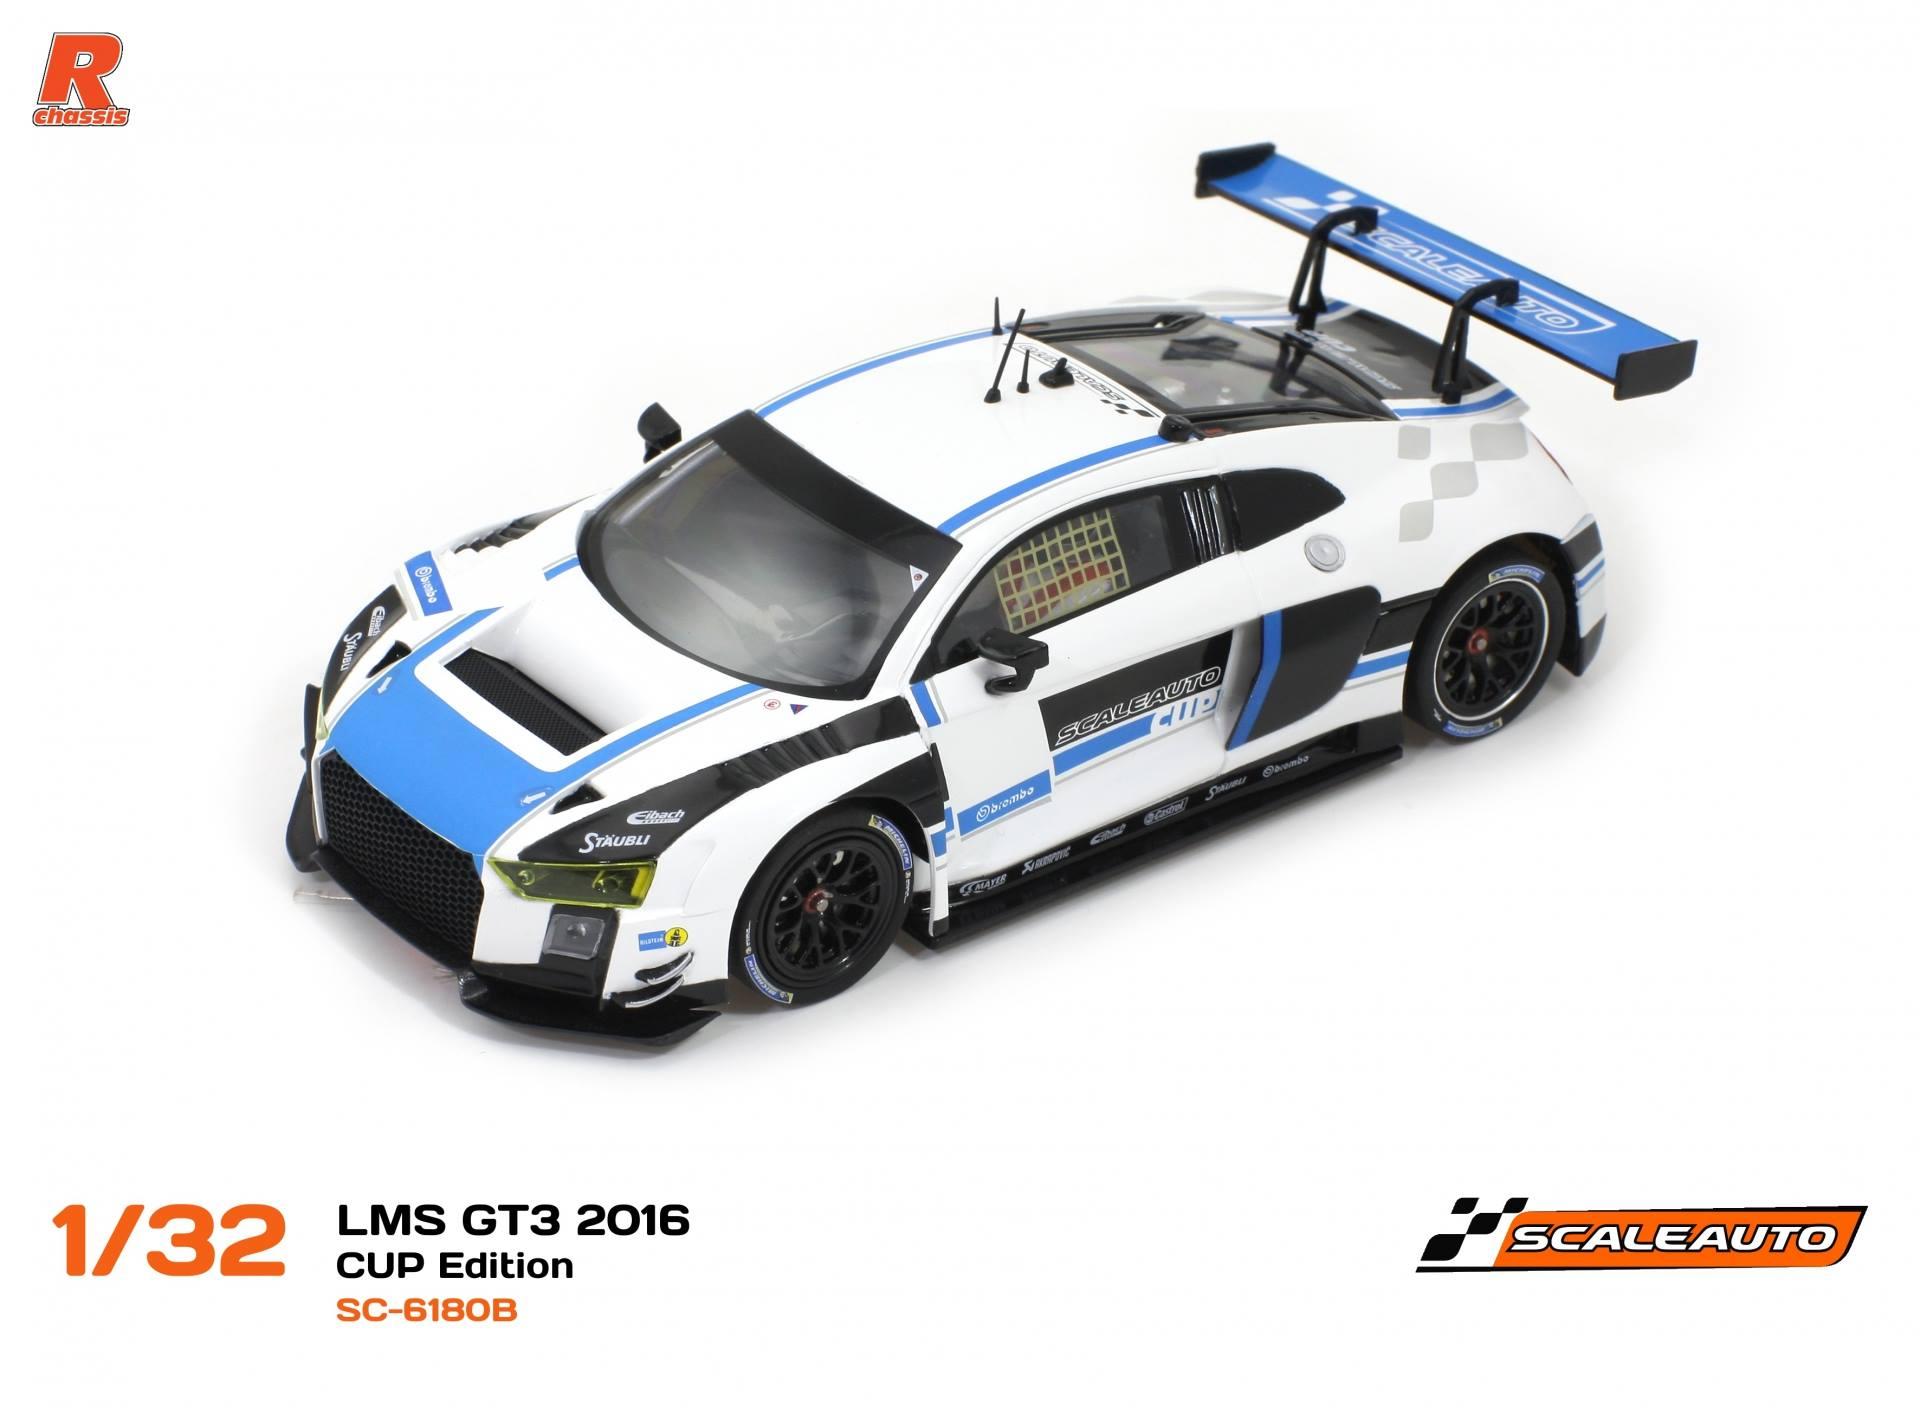 SC-6180 B LMS Gt3 Cup édition blanc / Bleu R-version AW